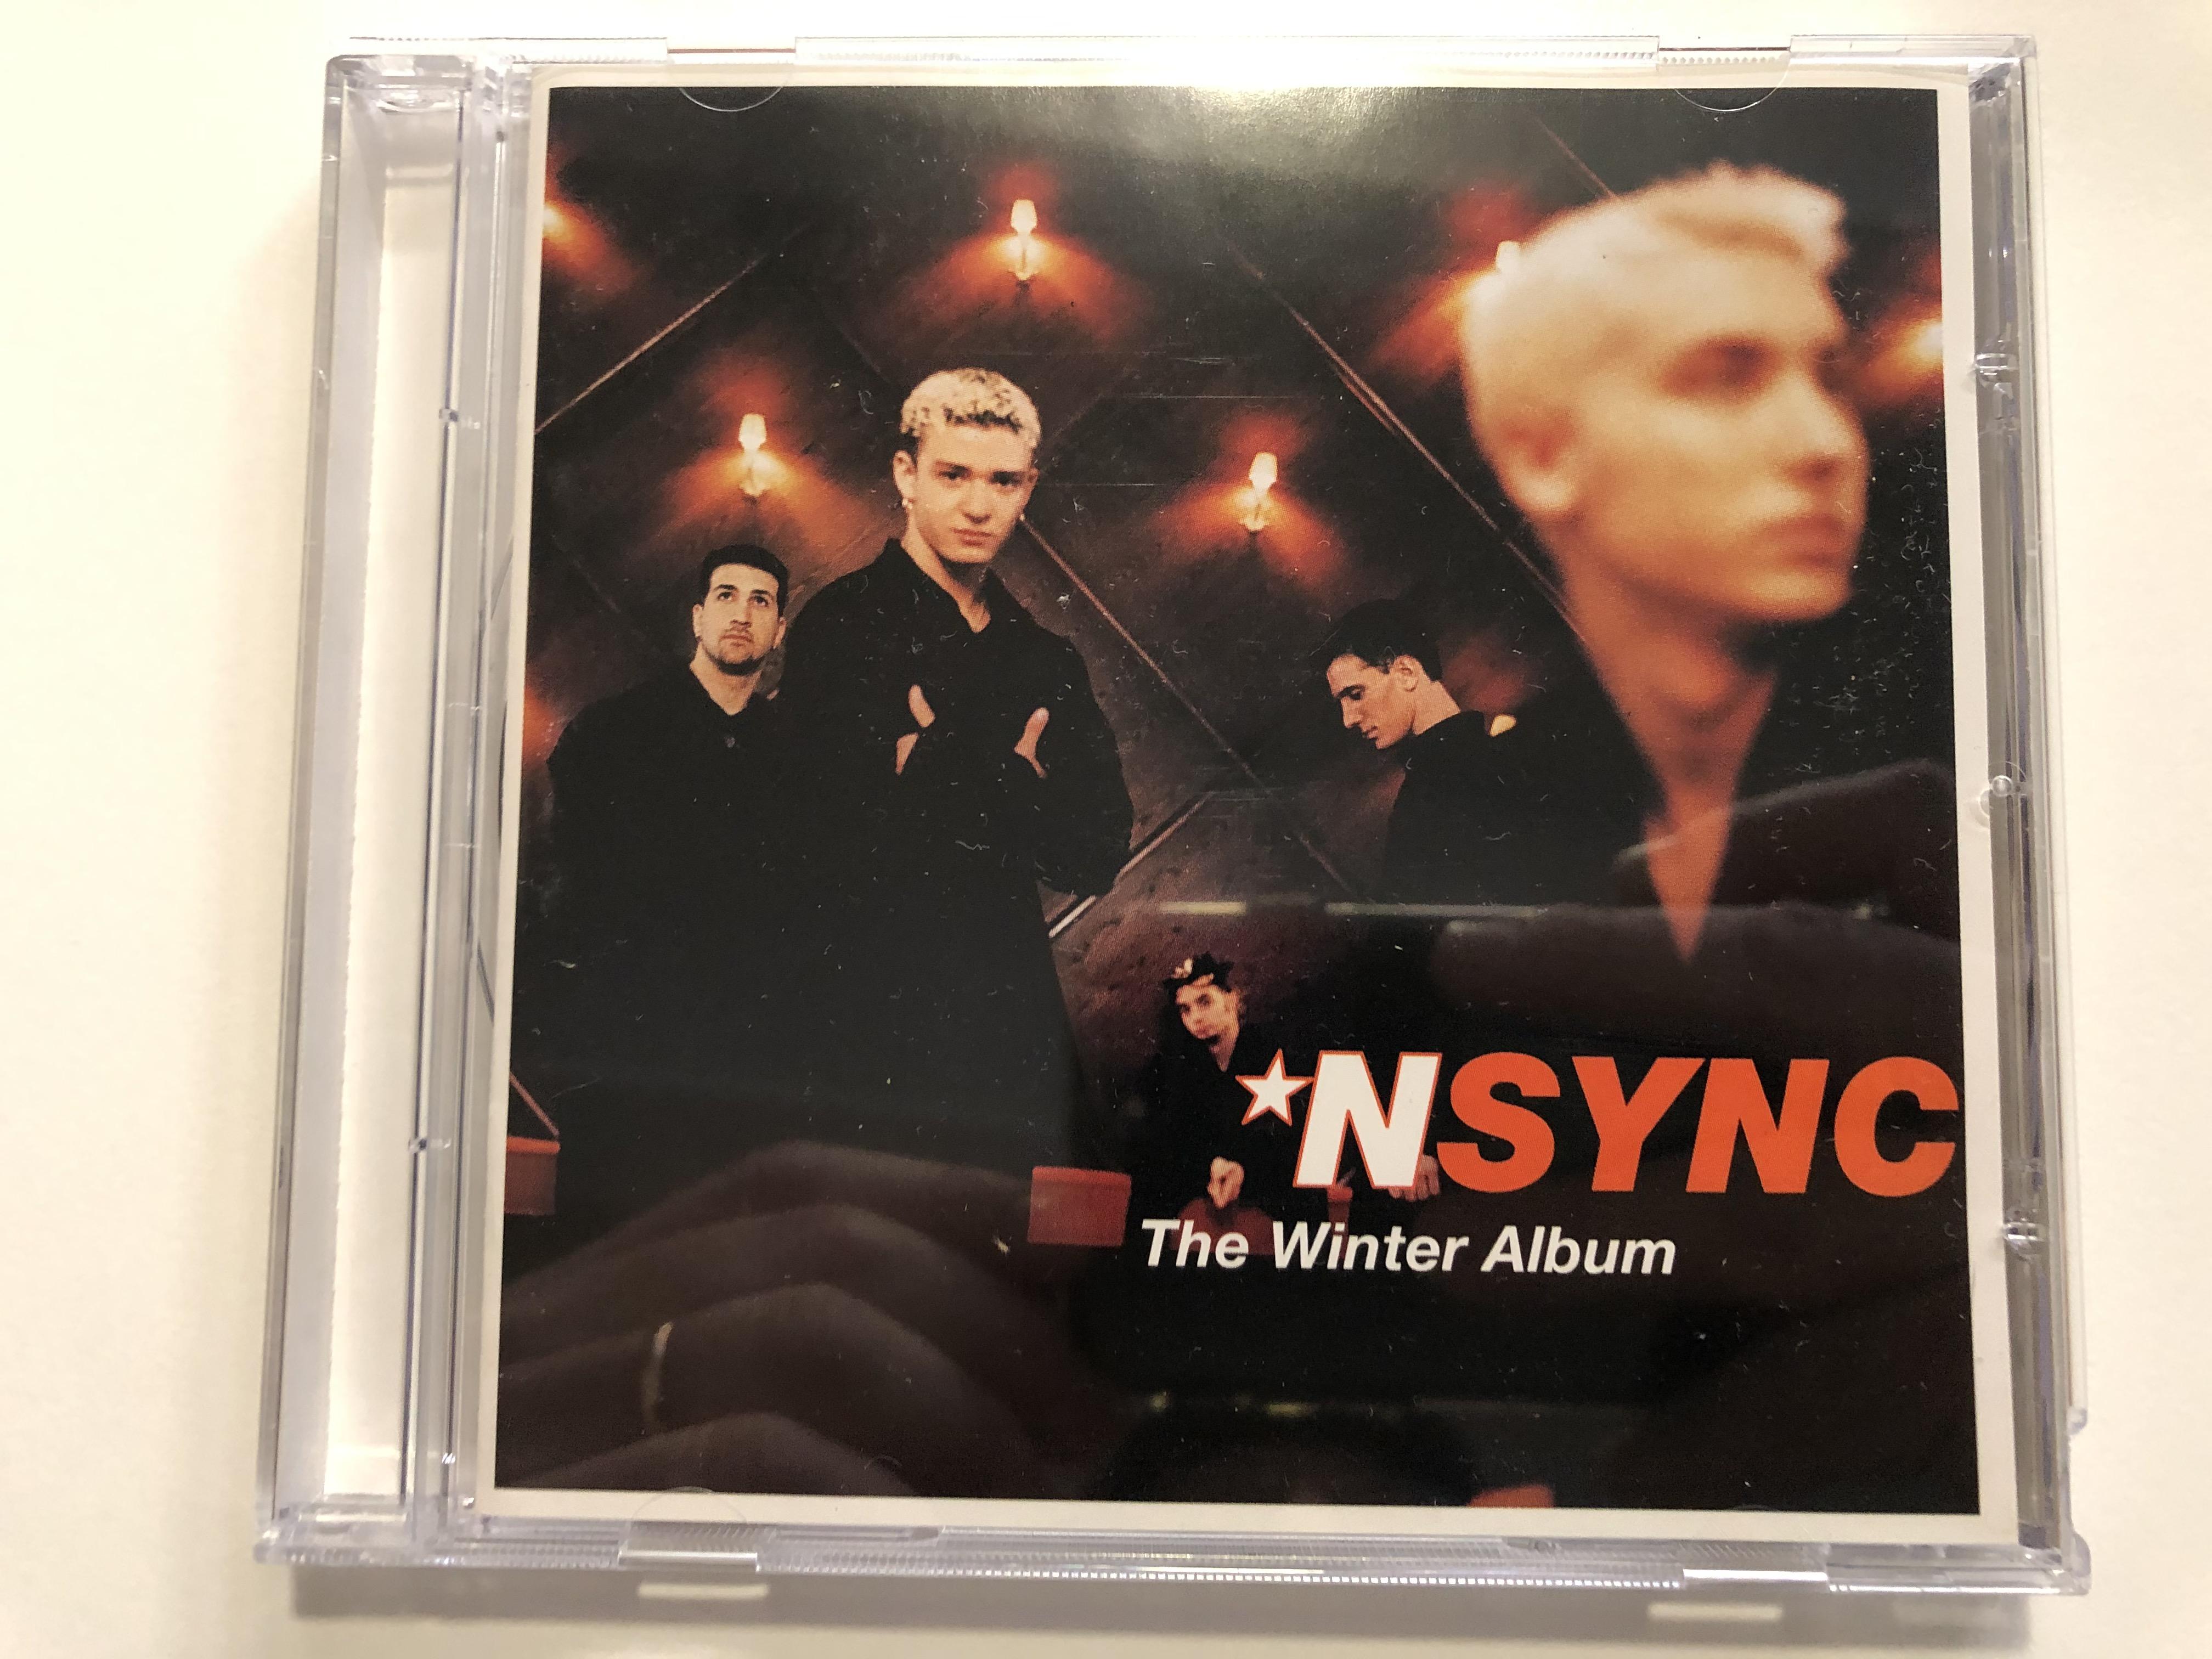 nsync-the-winter-album-bmg-audio-cd-1998-74321-58816-2-1-.jpg